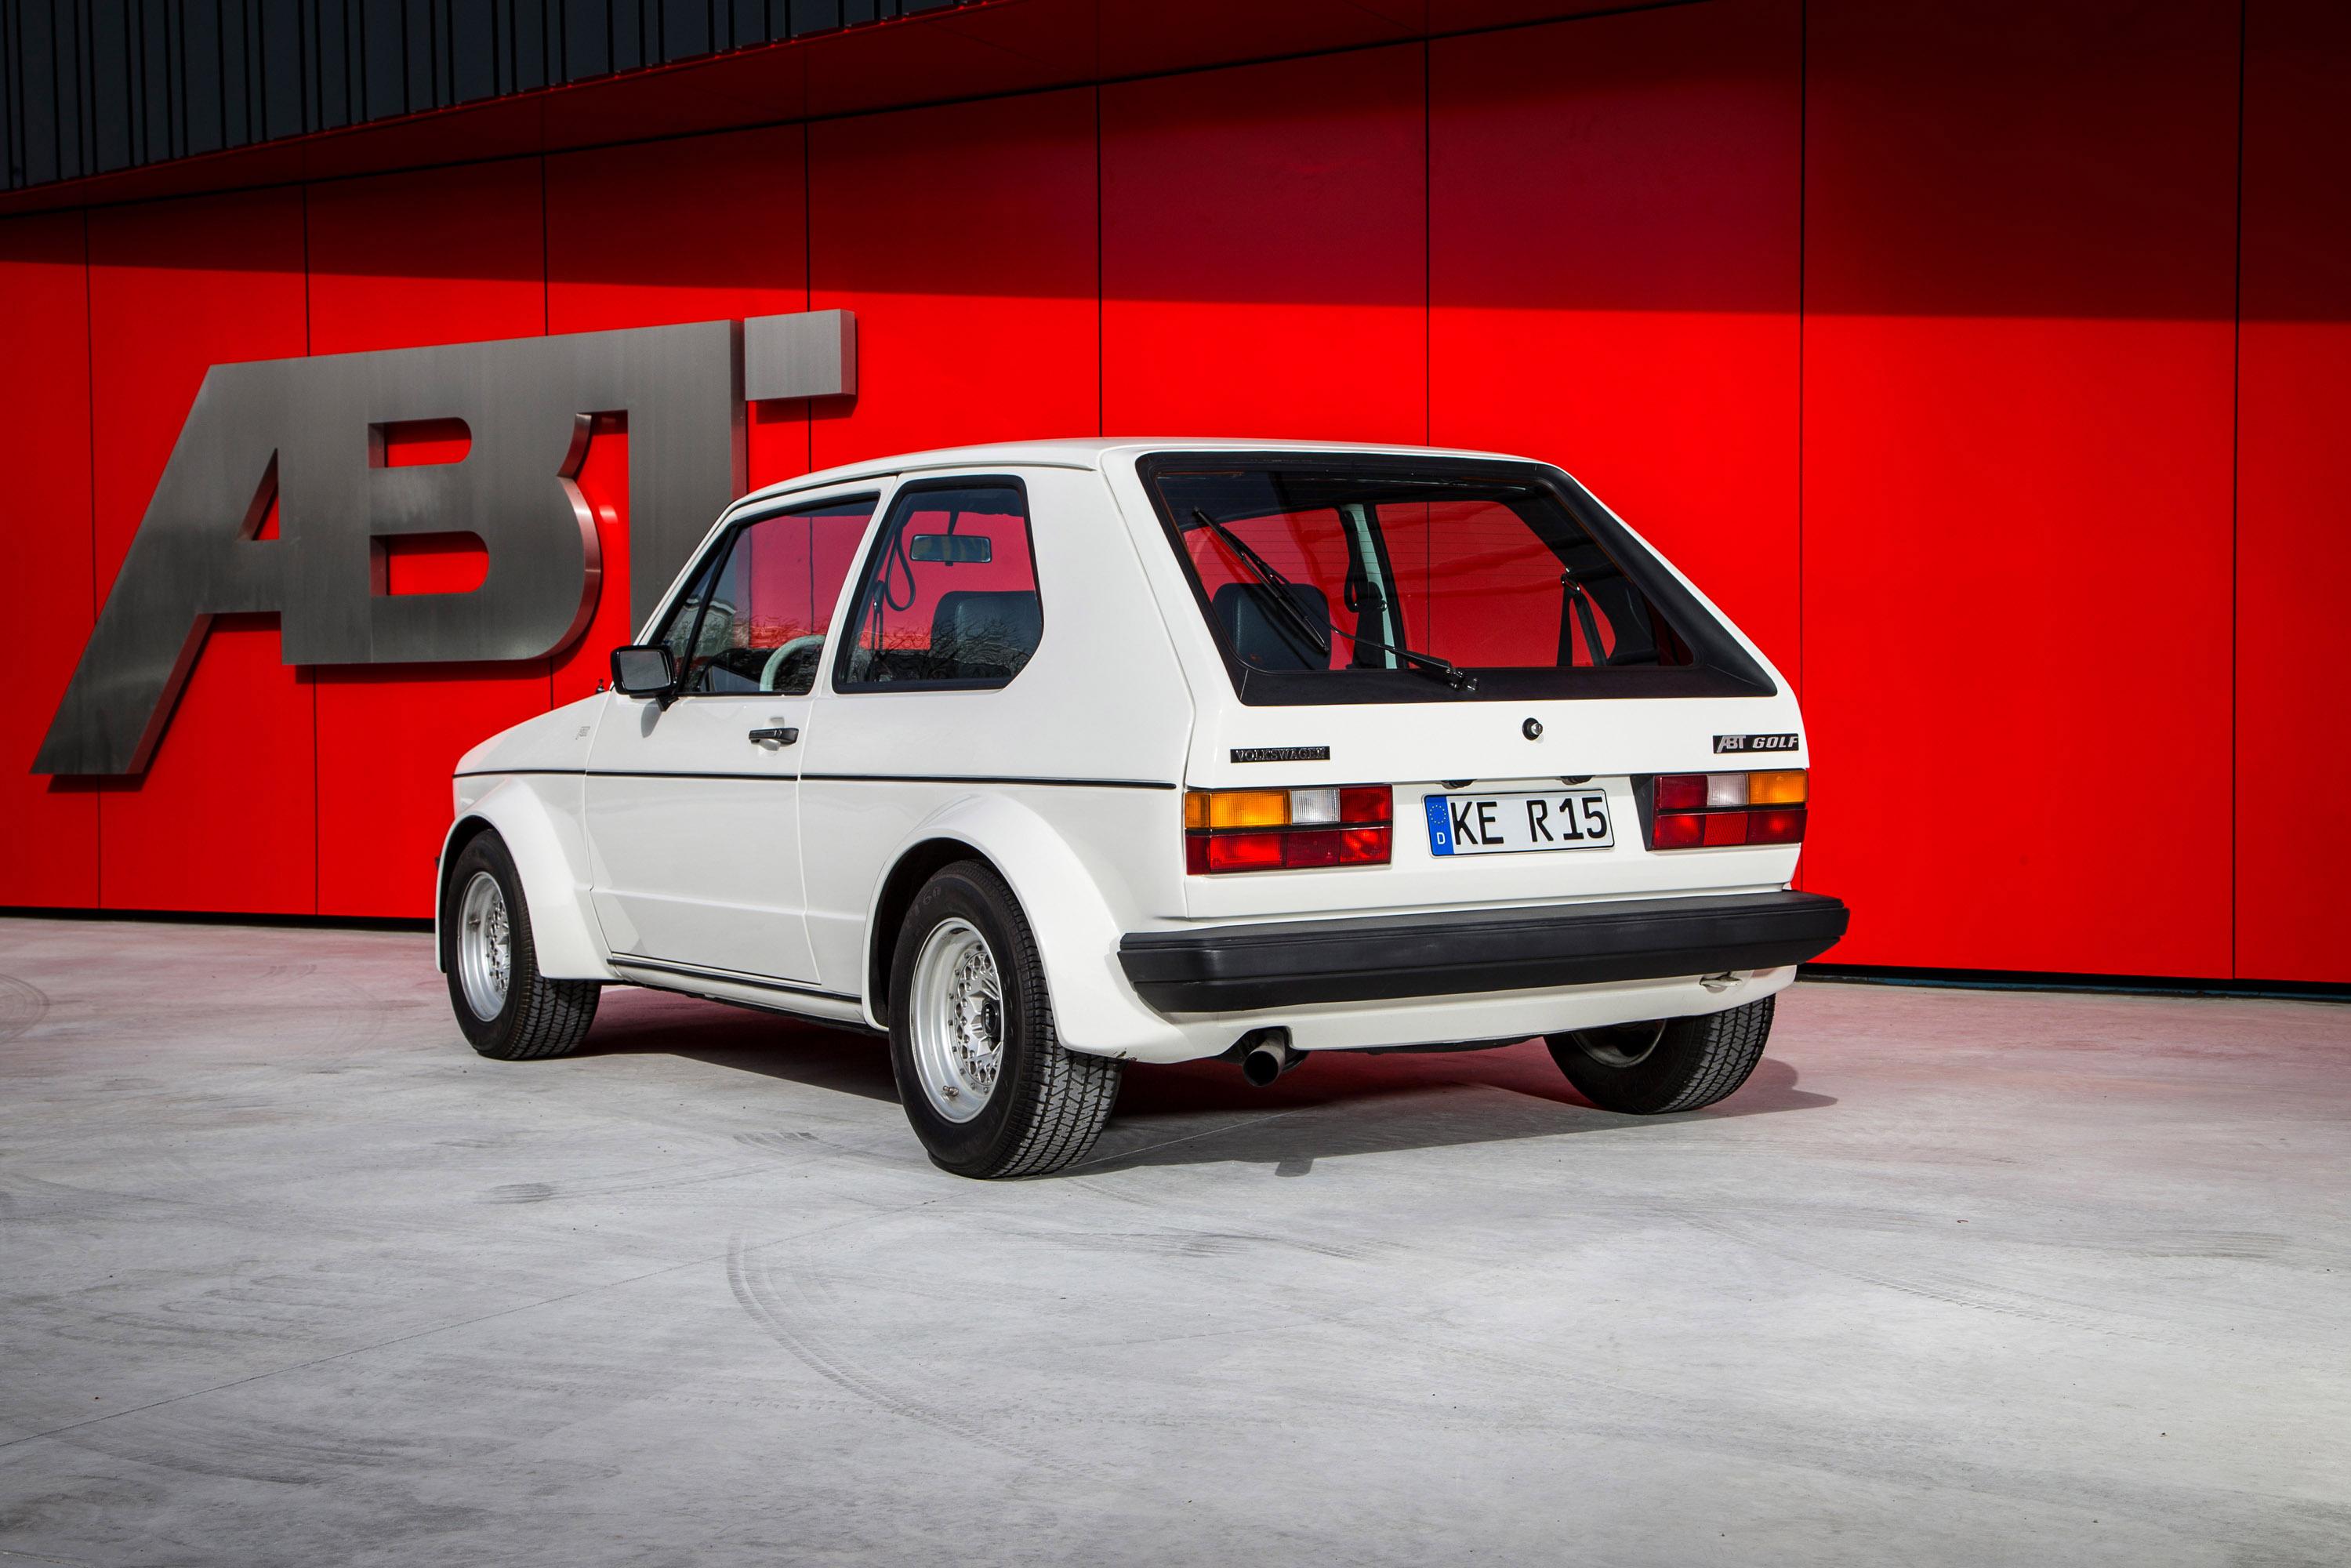 2014 Abt Volkswagen Golf I Gti Hd Pictures